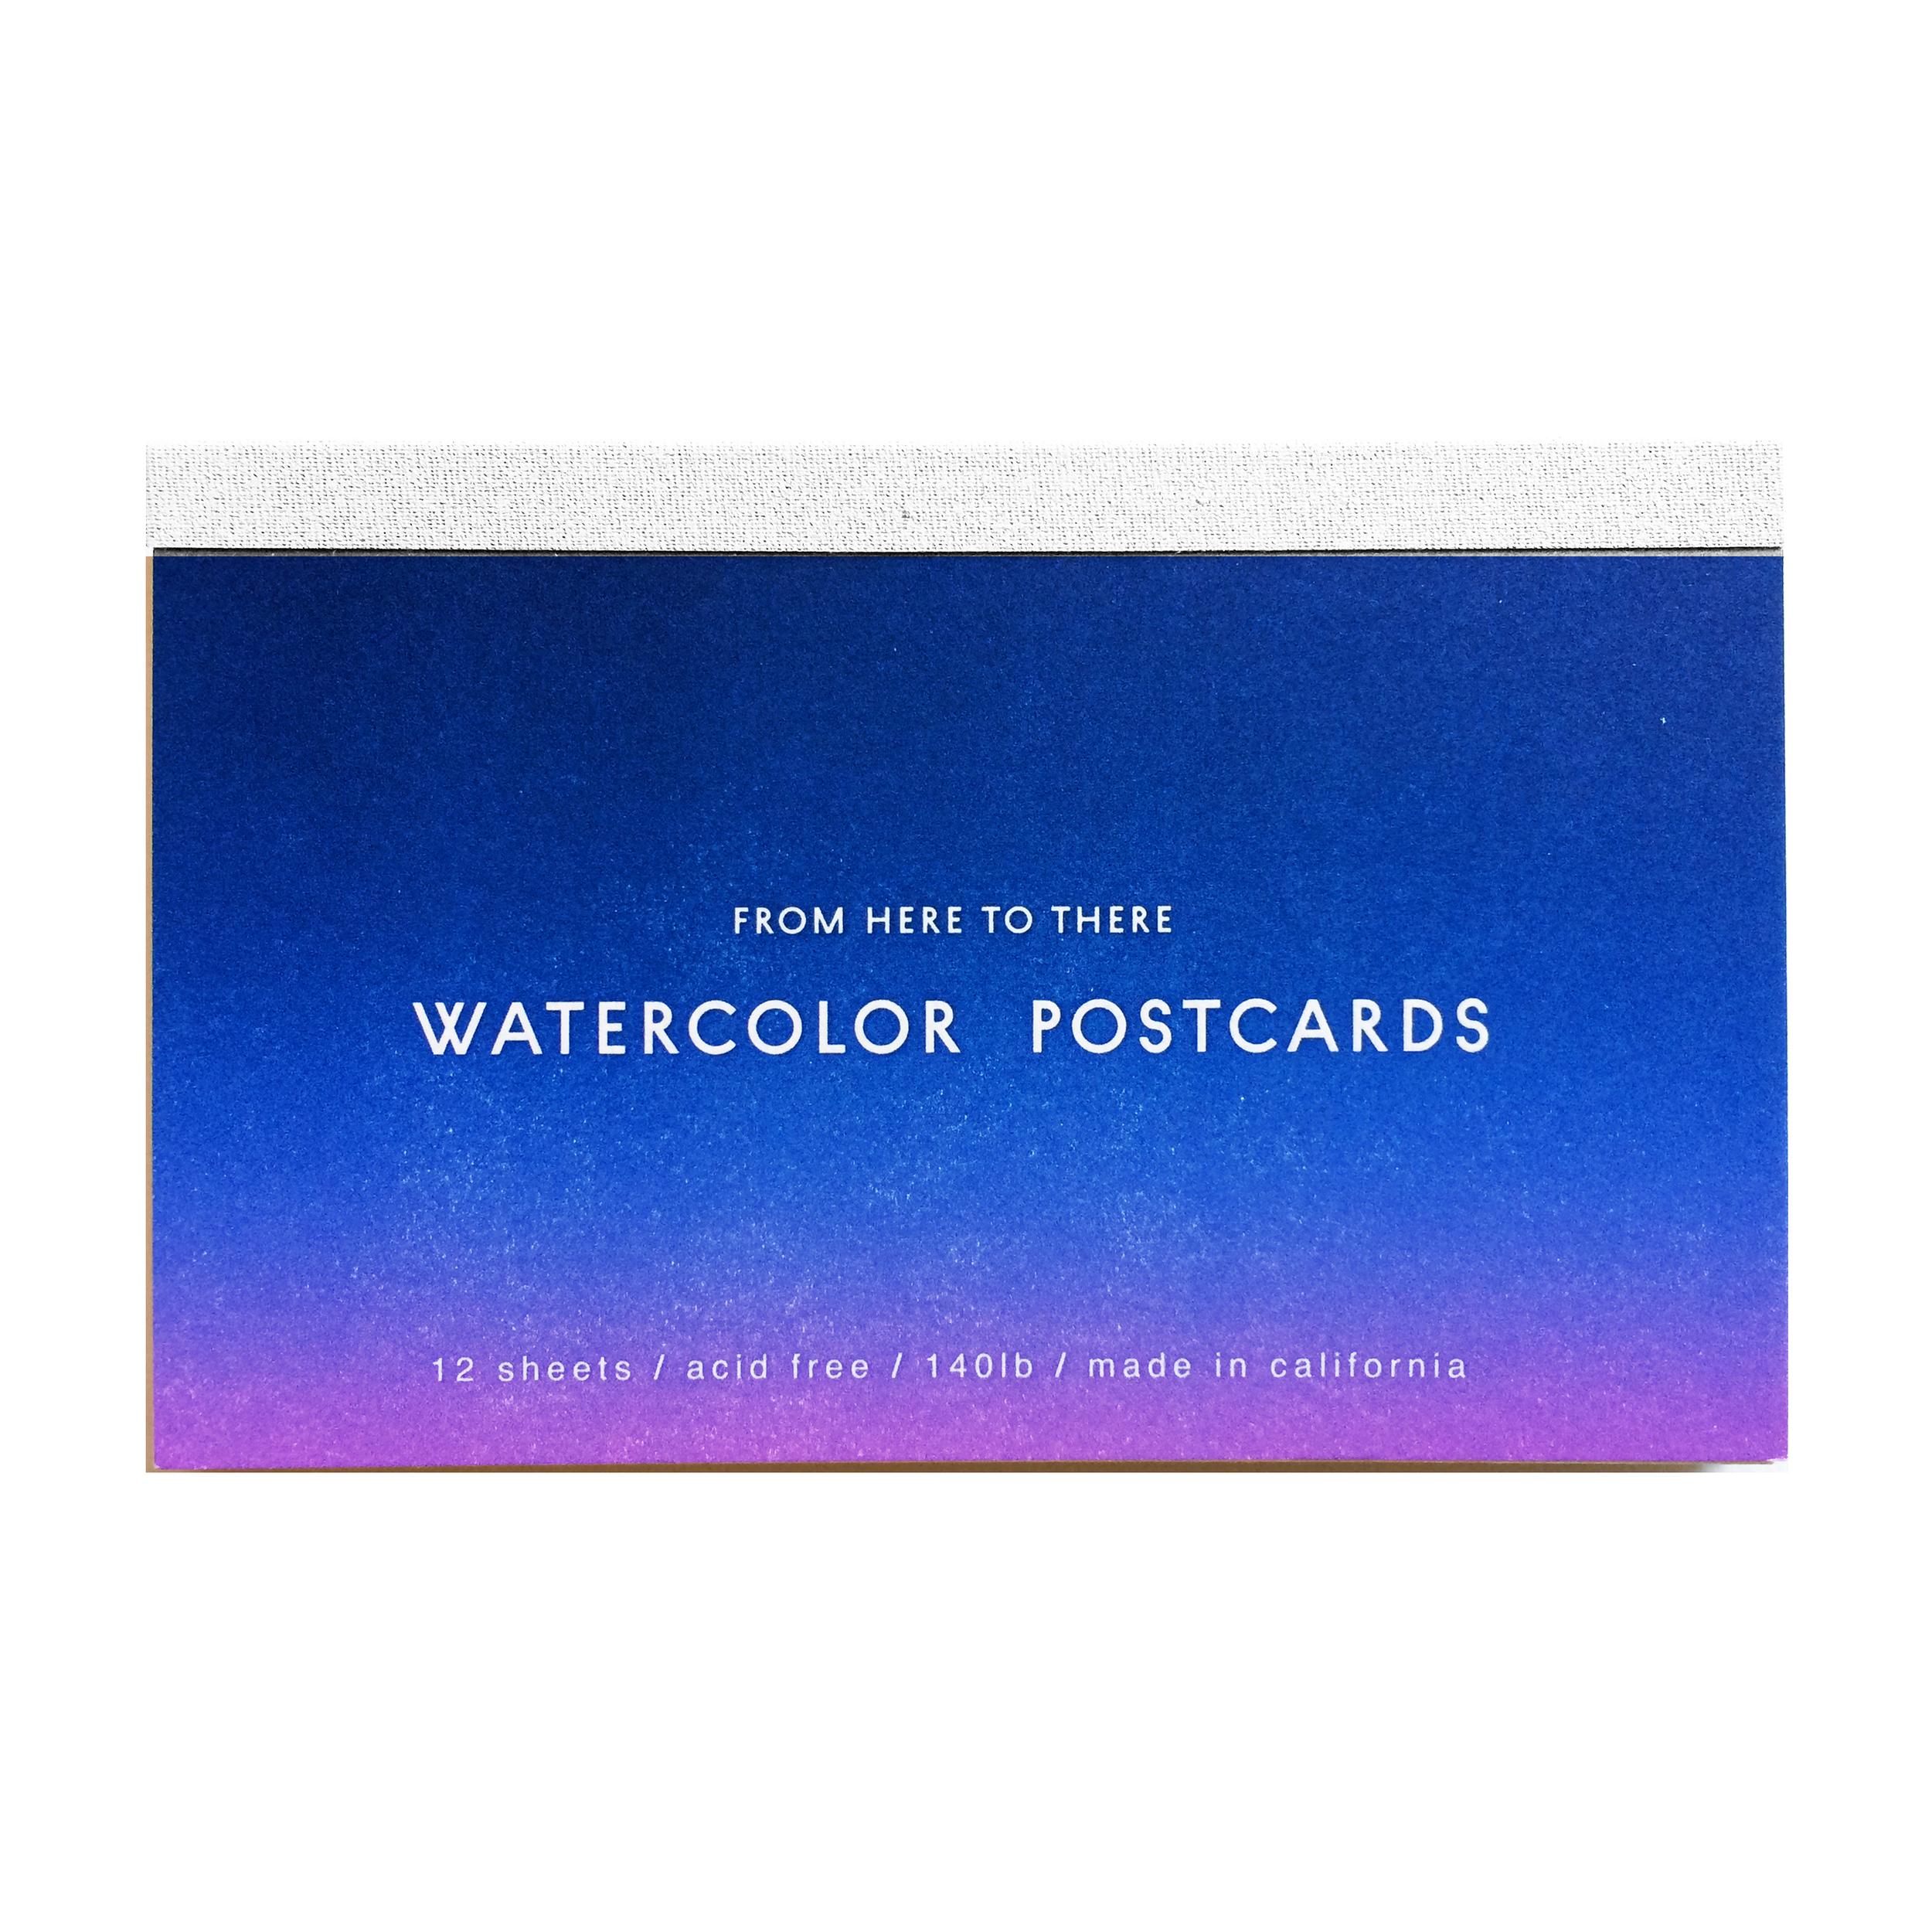 Letterpressed Watercolor Postcards